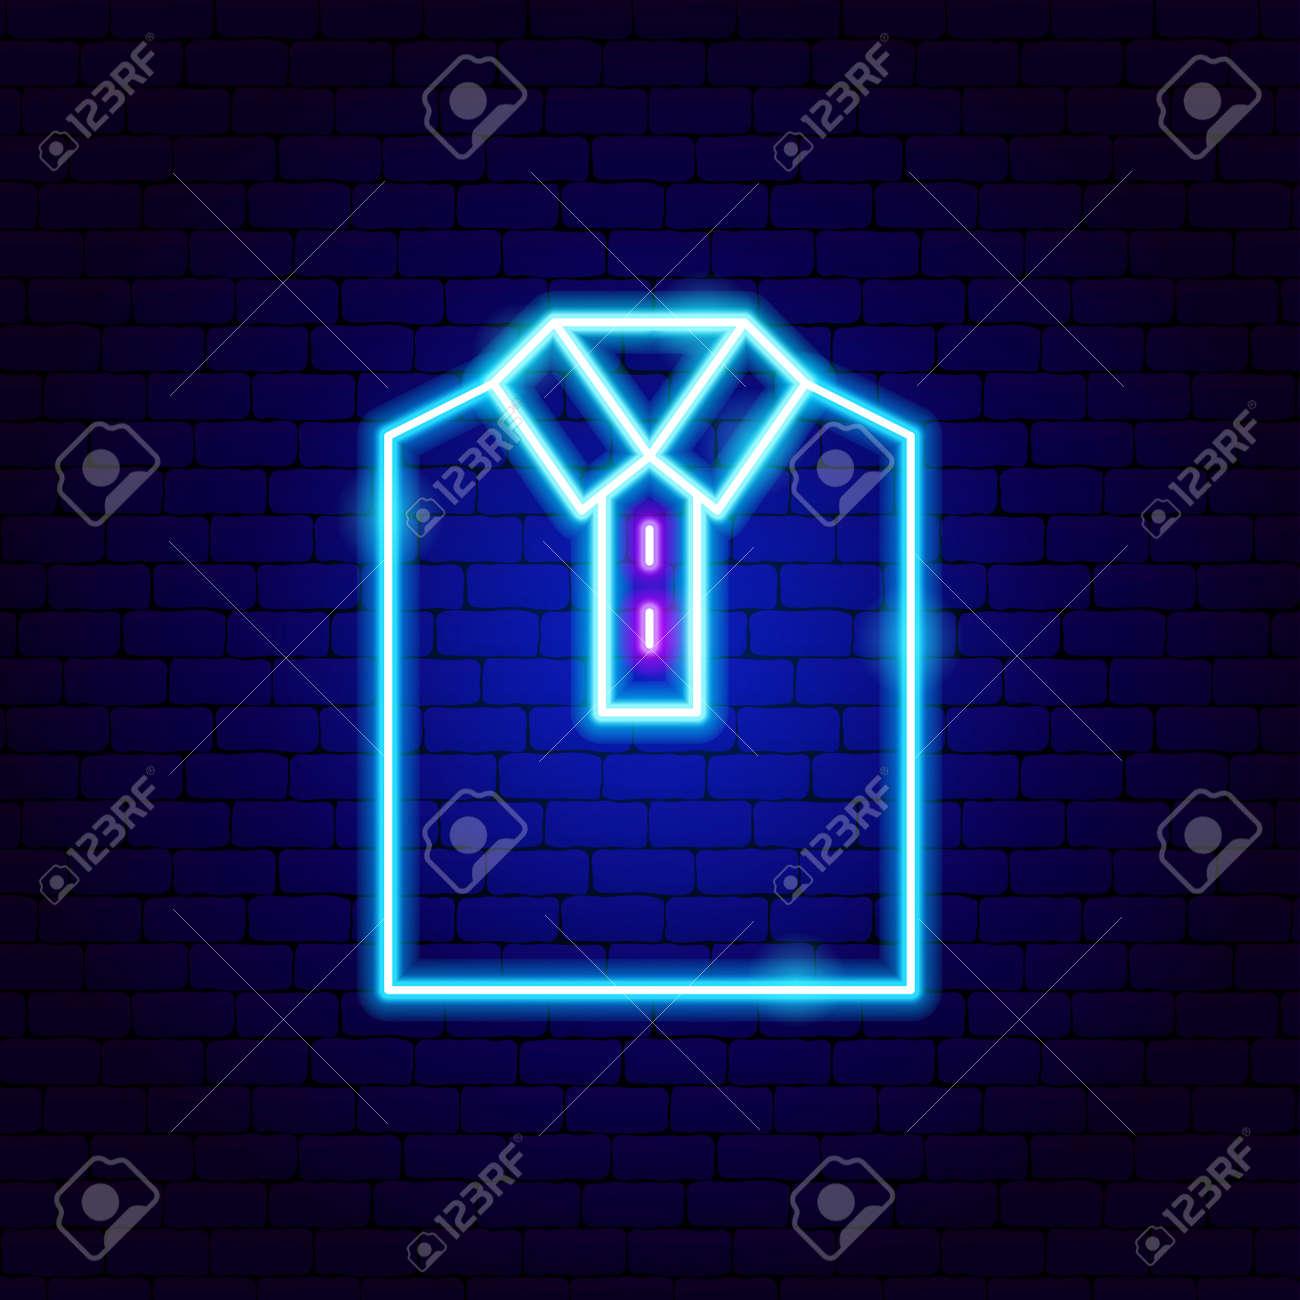 Shirt Collar Neon Sign - 168963318